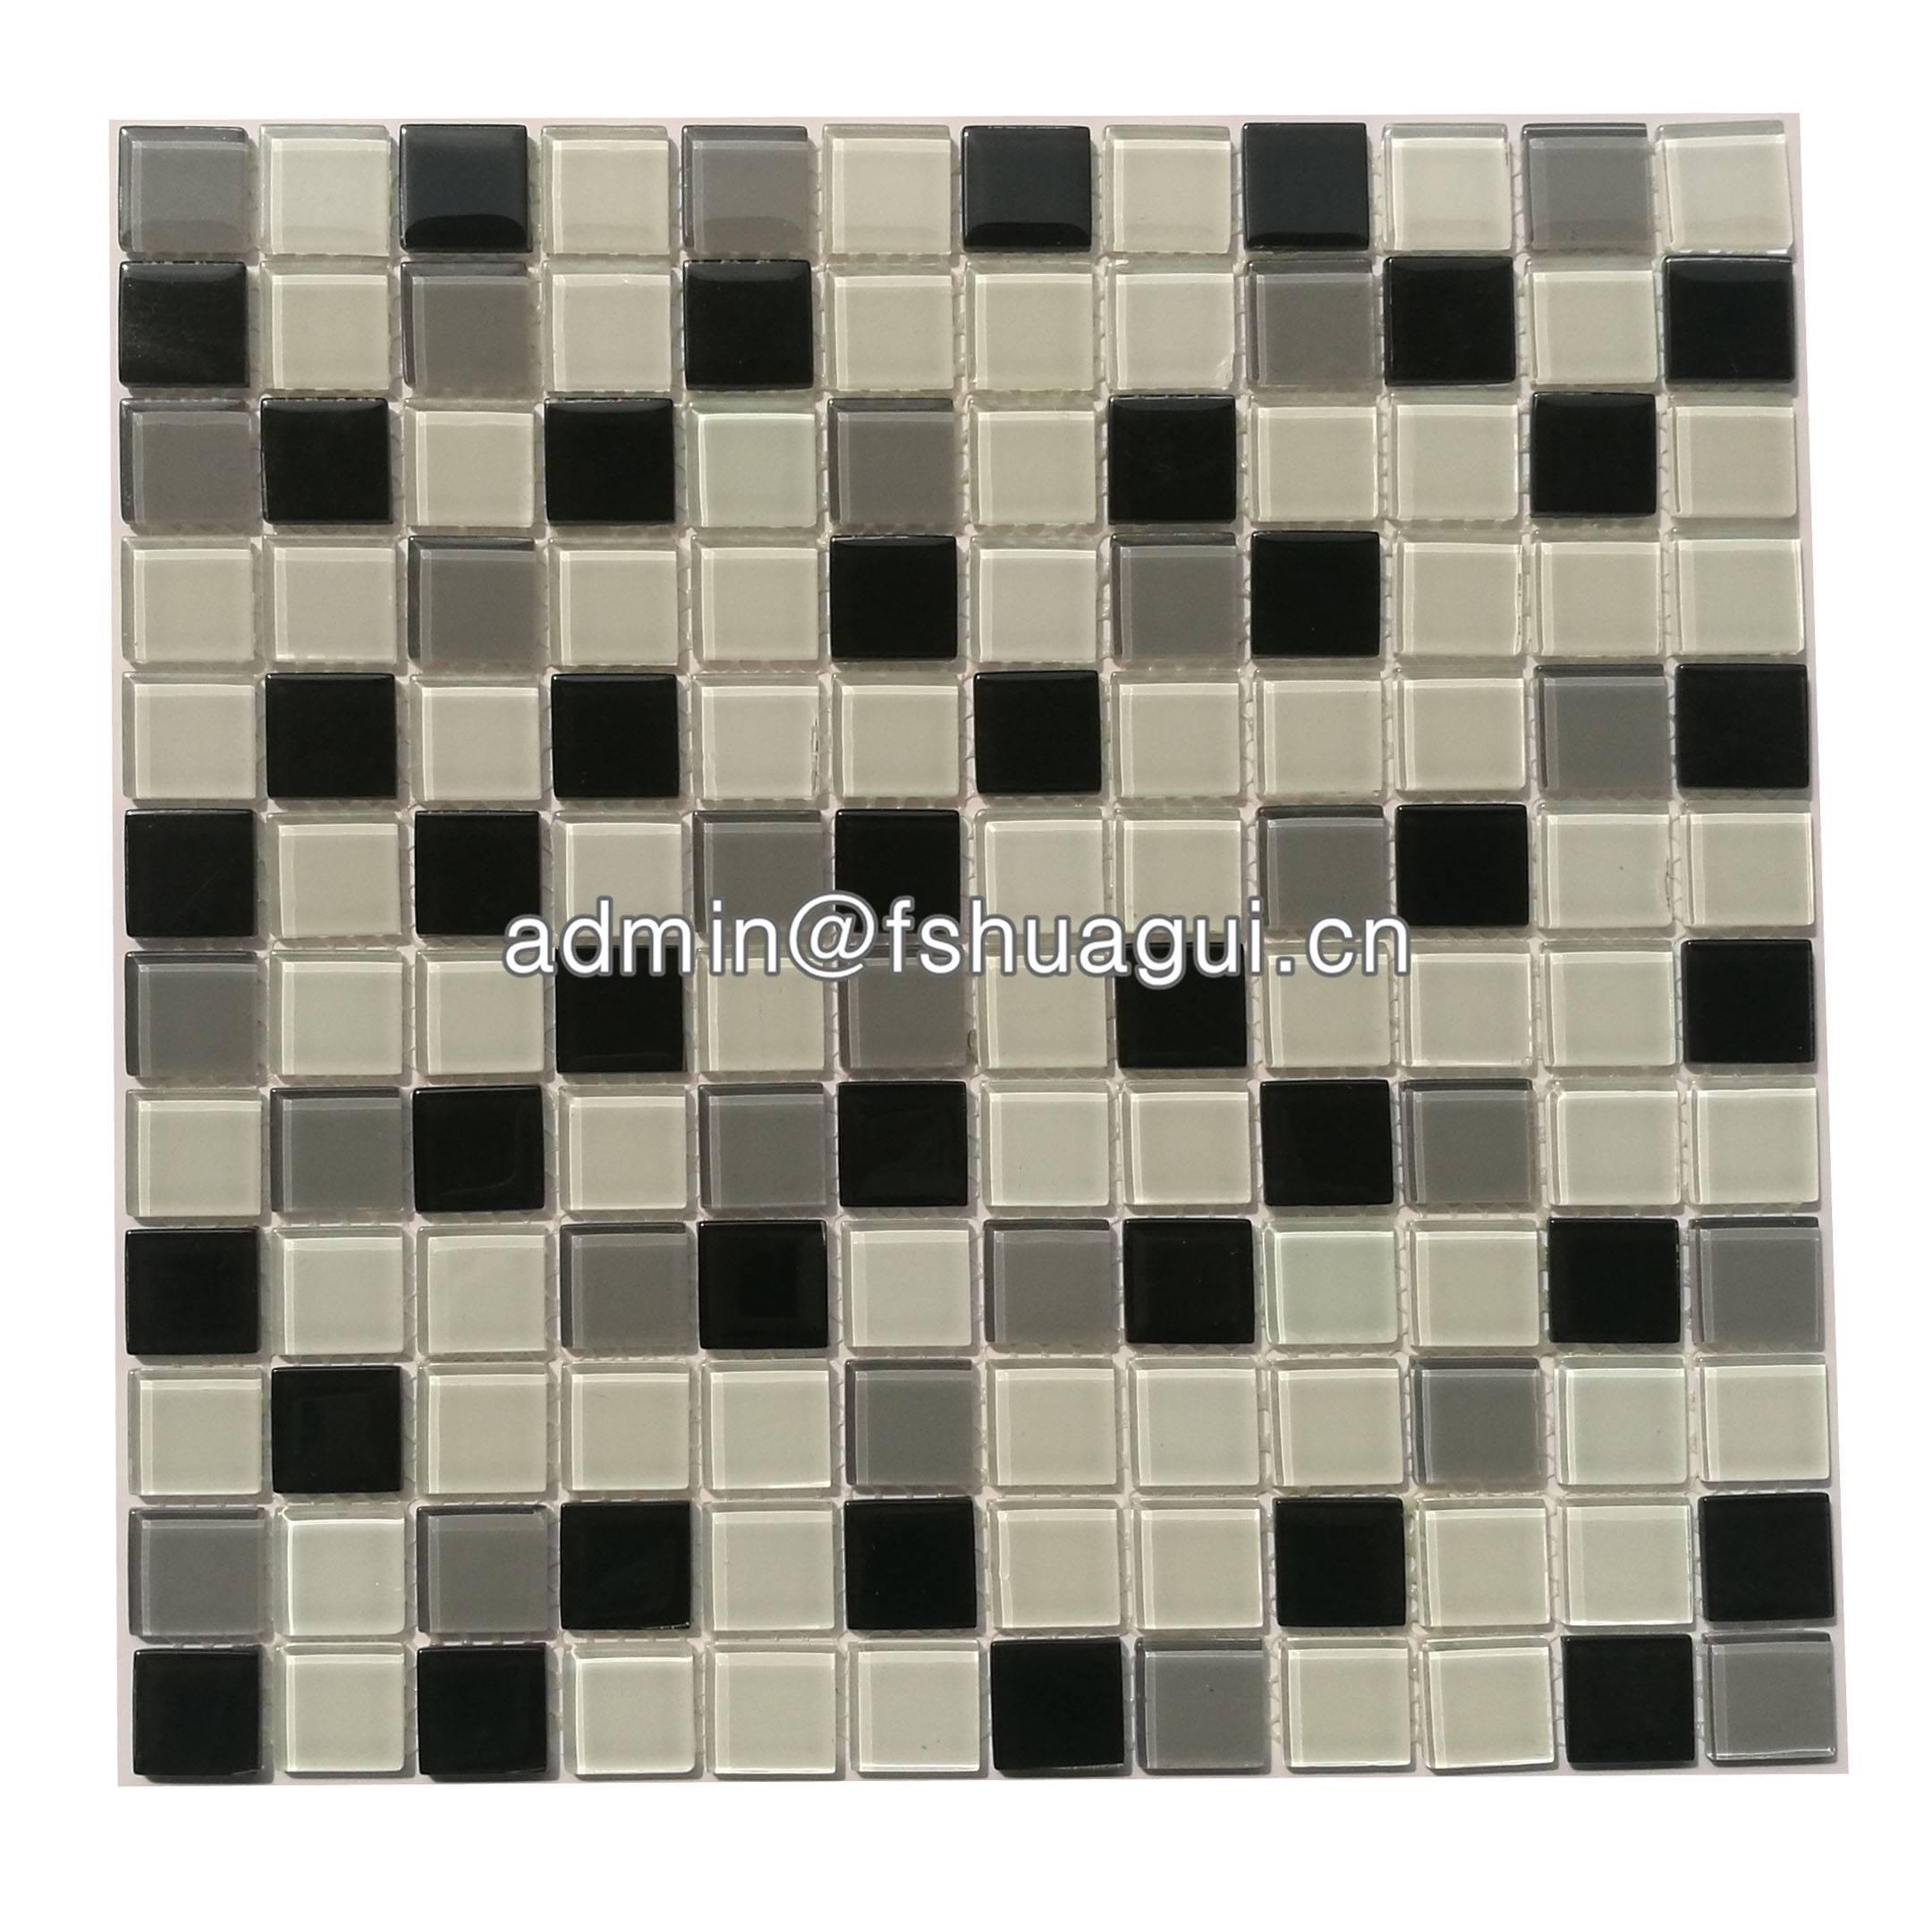 Huagui Black and white glass mosaic tile design for backsplash walls HG-15-6 GLASS MOSAIC TILE image7